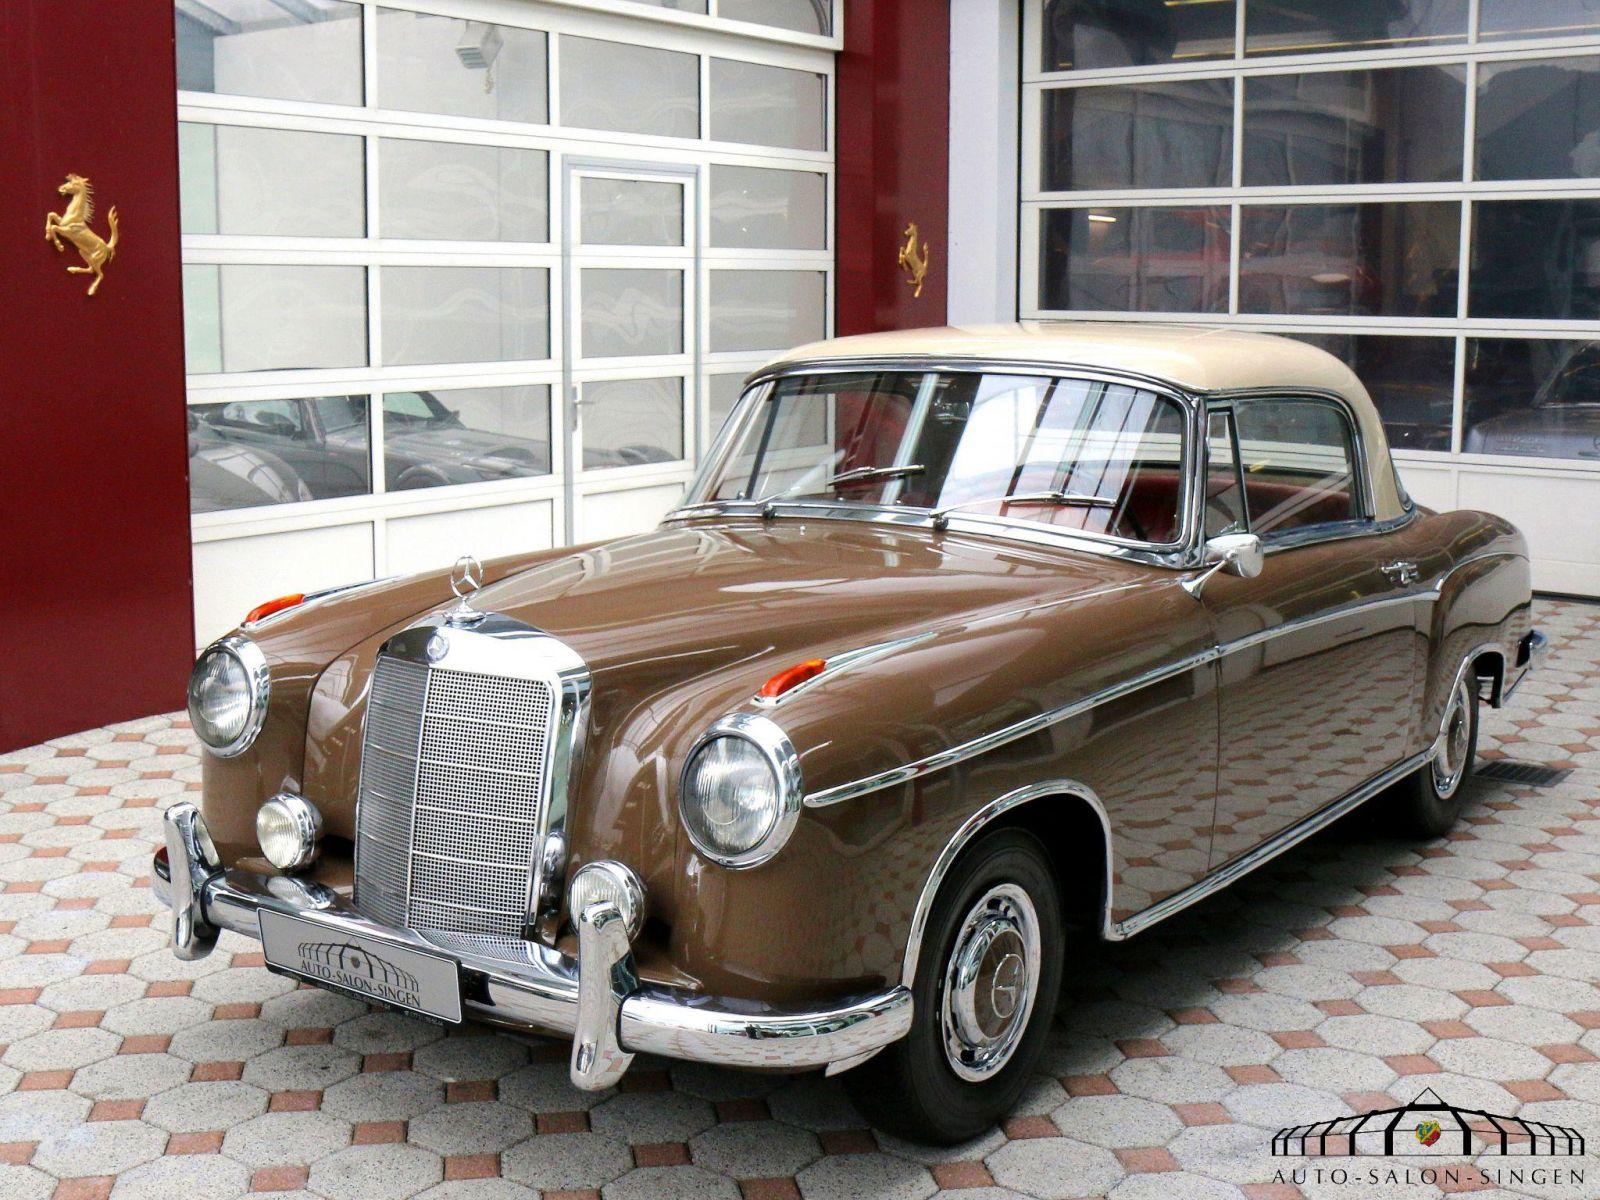 Mercedes benz 220 s ponton coupe coup auto salon singen for Mercedes benz ponton